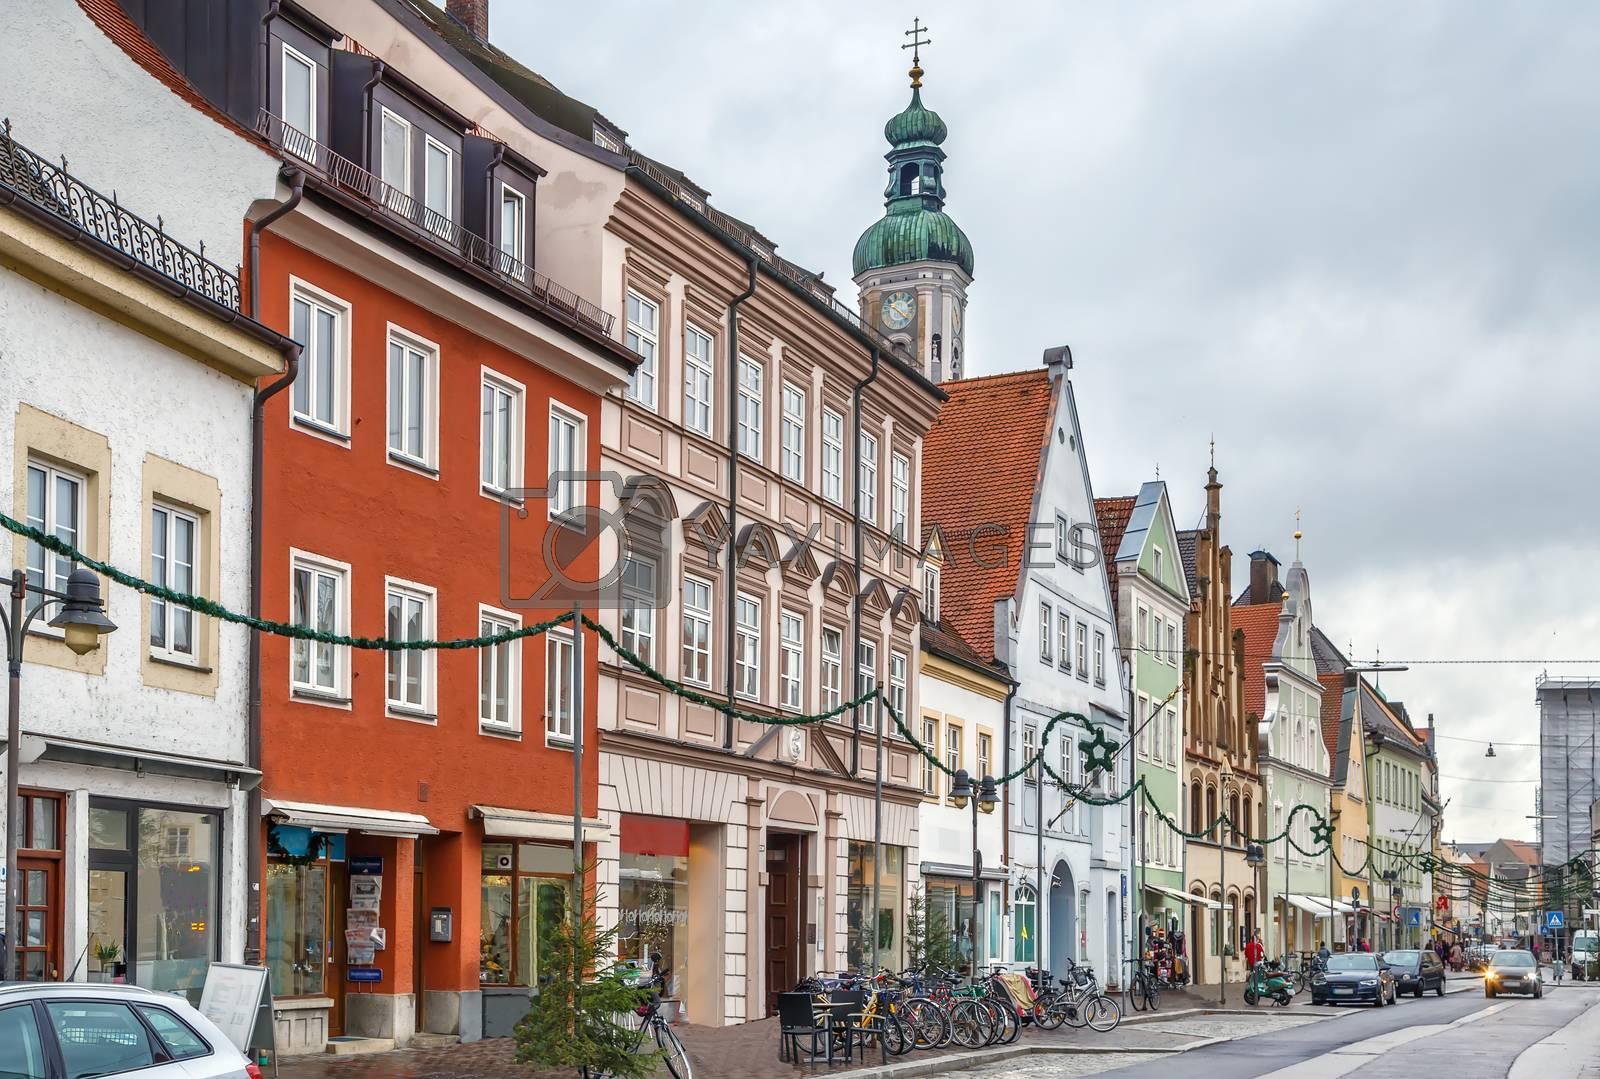 Royalty free image of Street in Freising, Germany by borisb17